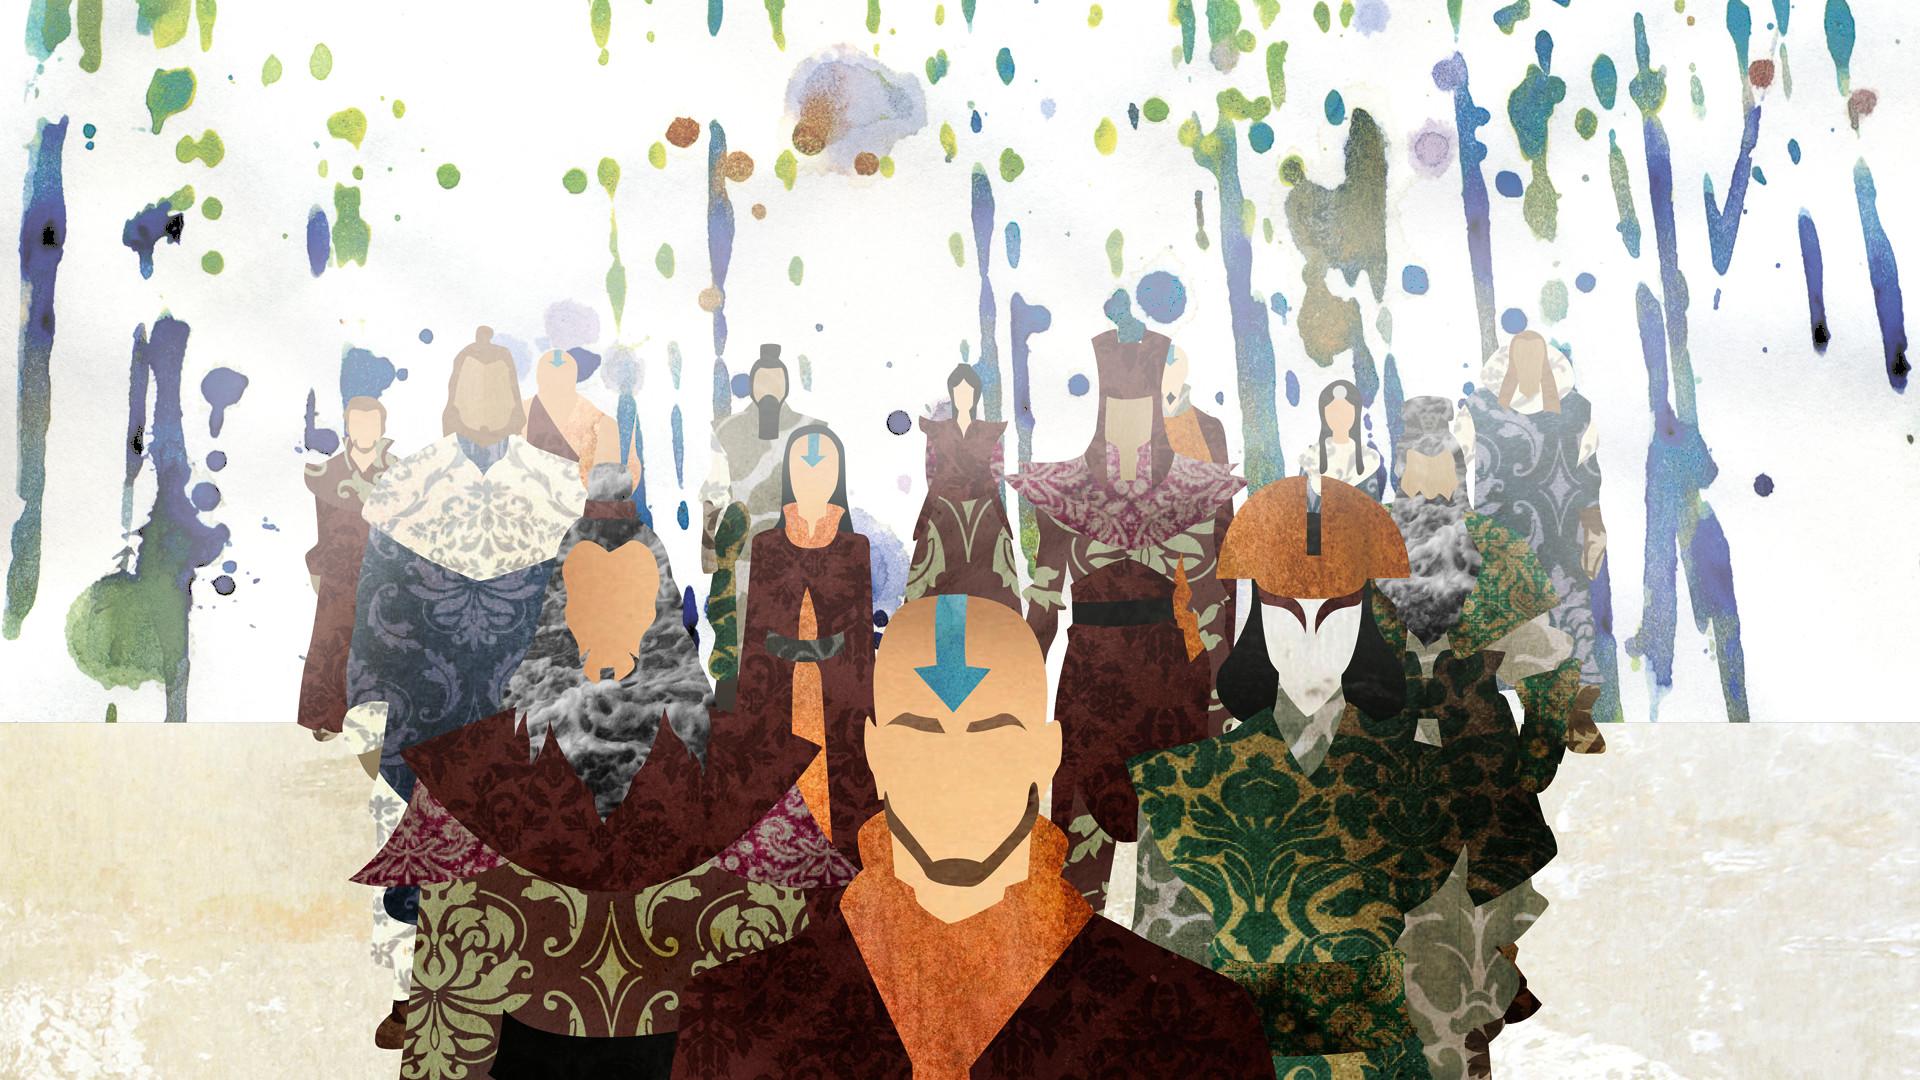 Avatar Aang Wallpaper Hd Legend Of Korra Wallpaper Hd 70 Images